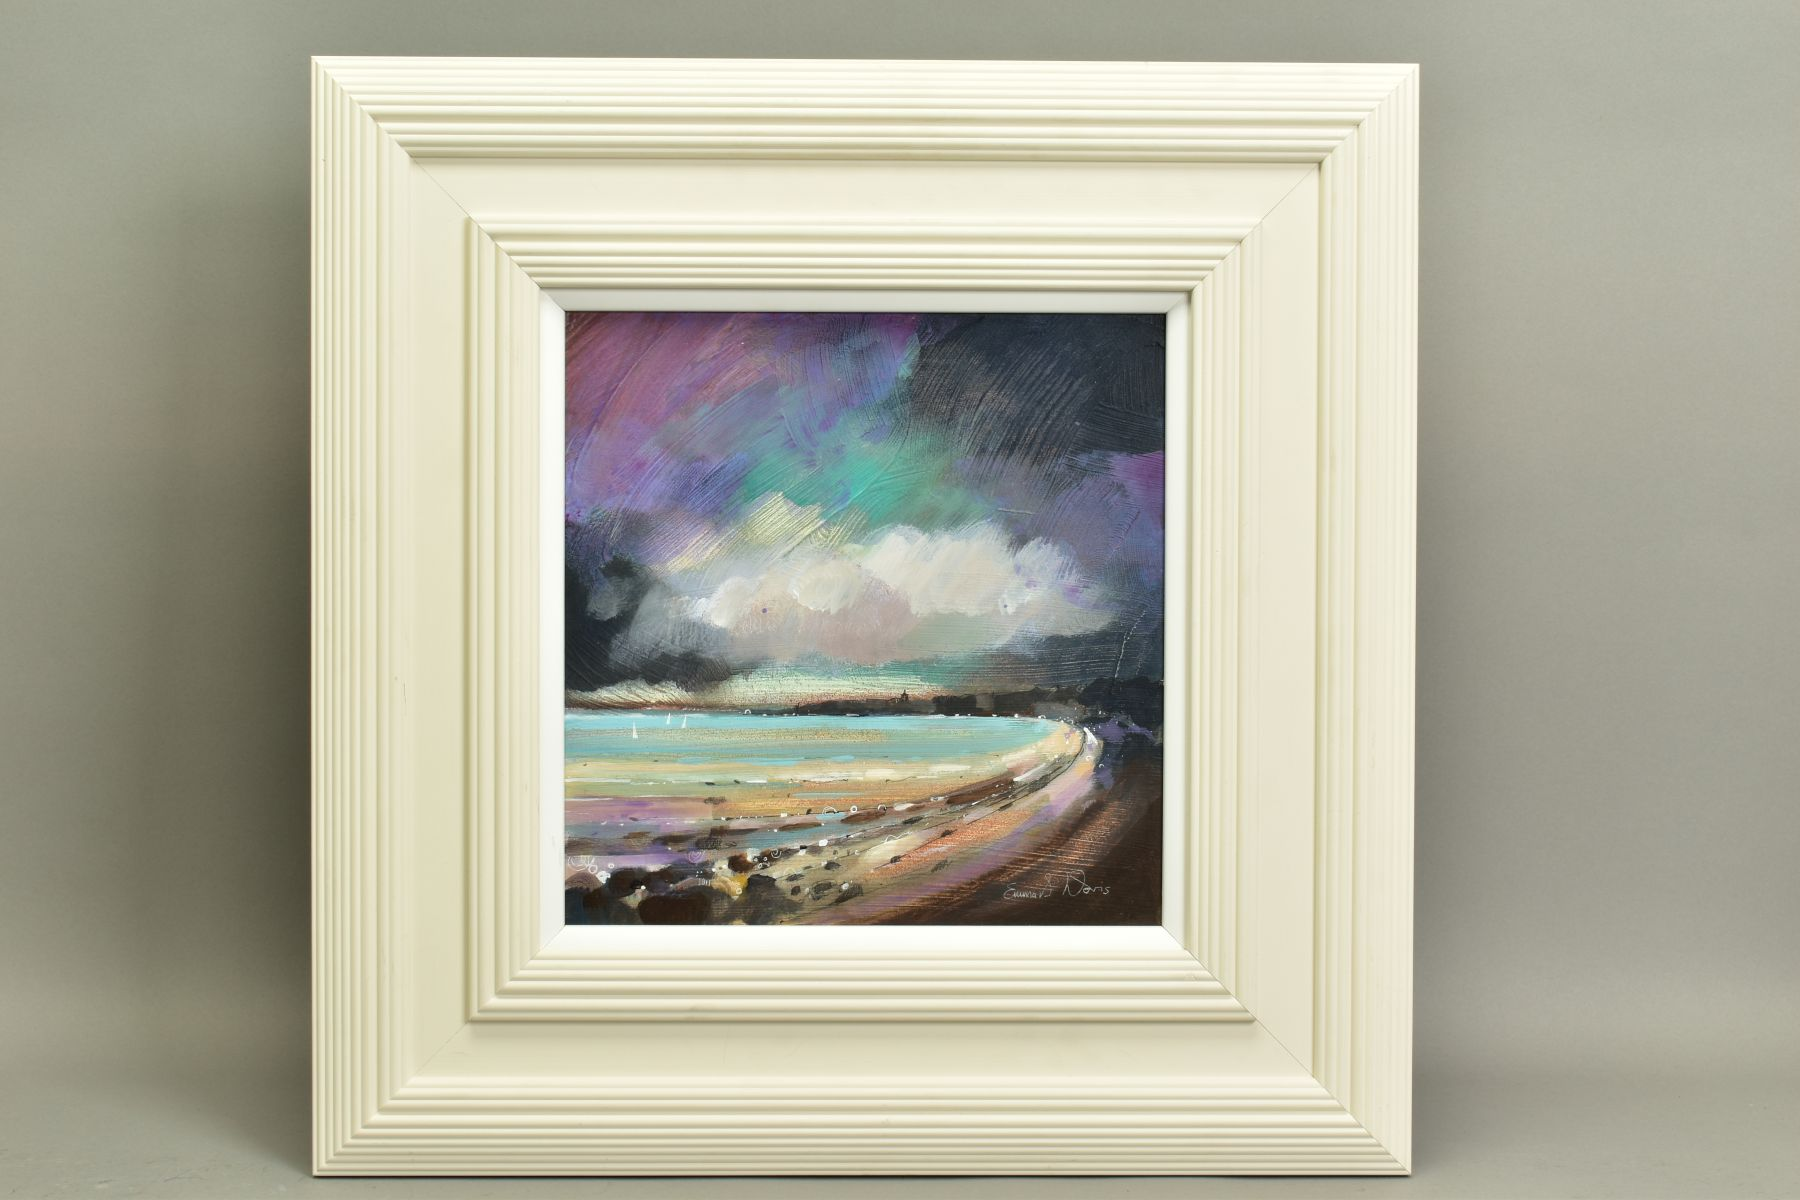 EMMA S. DAVIS (BRITISH 1975), 'Sailing at St Andrews', a Scottish coastal landscape, signed bottom